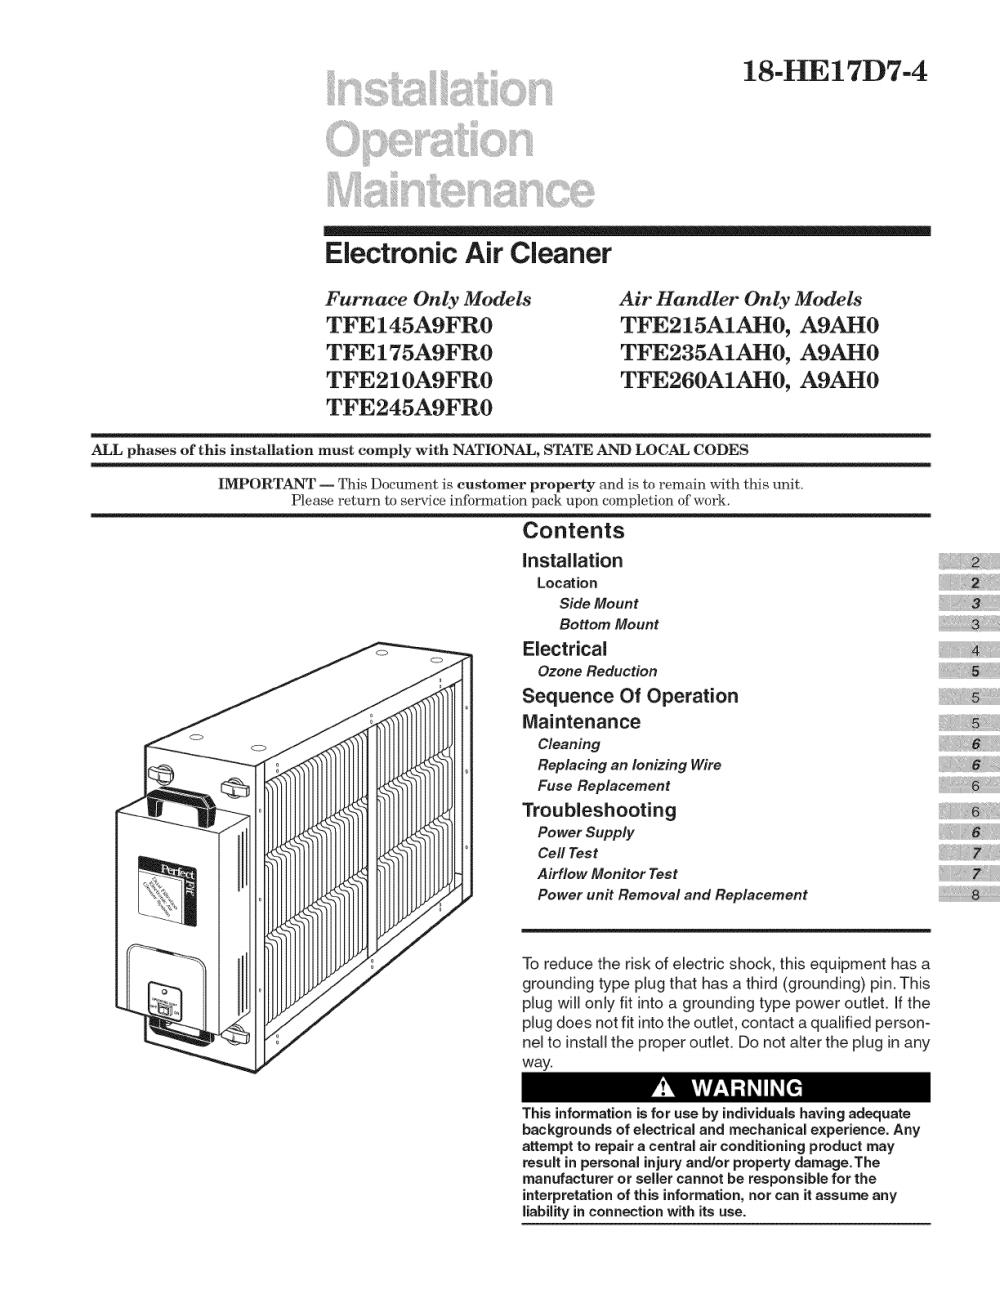 medium resolution of trane bwv724a100d1 air handler wiring diagram example electrical trane wiring diagrams model fine trane air handler